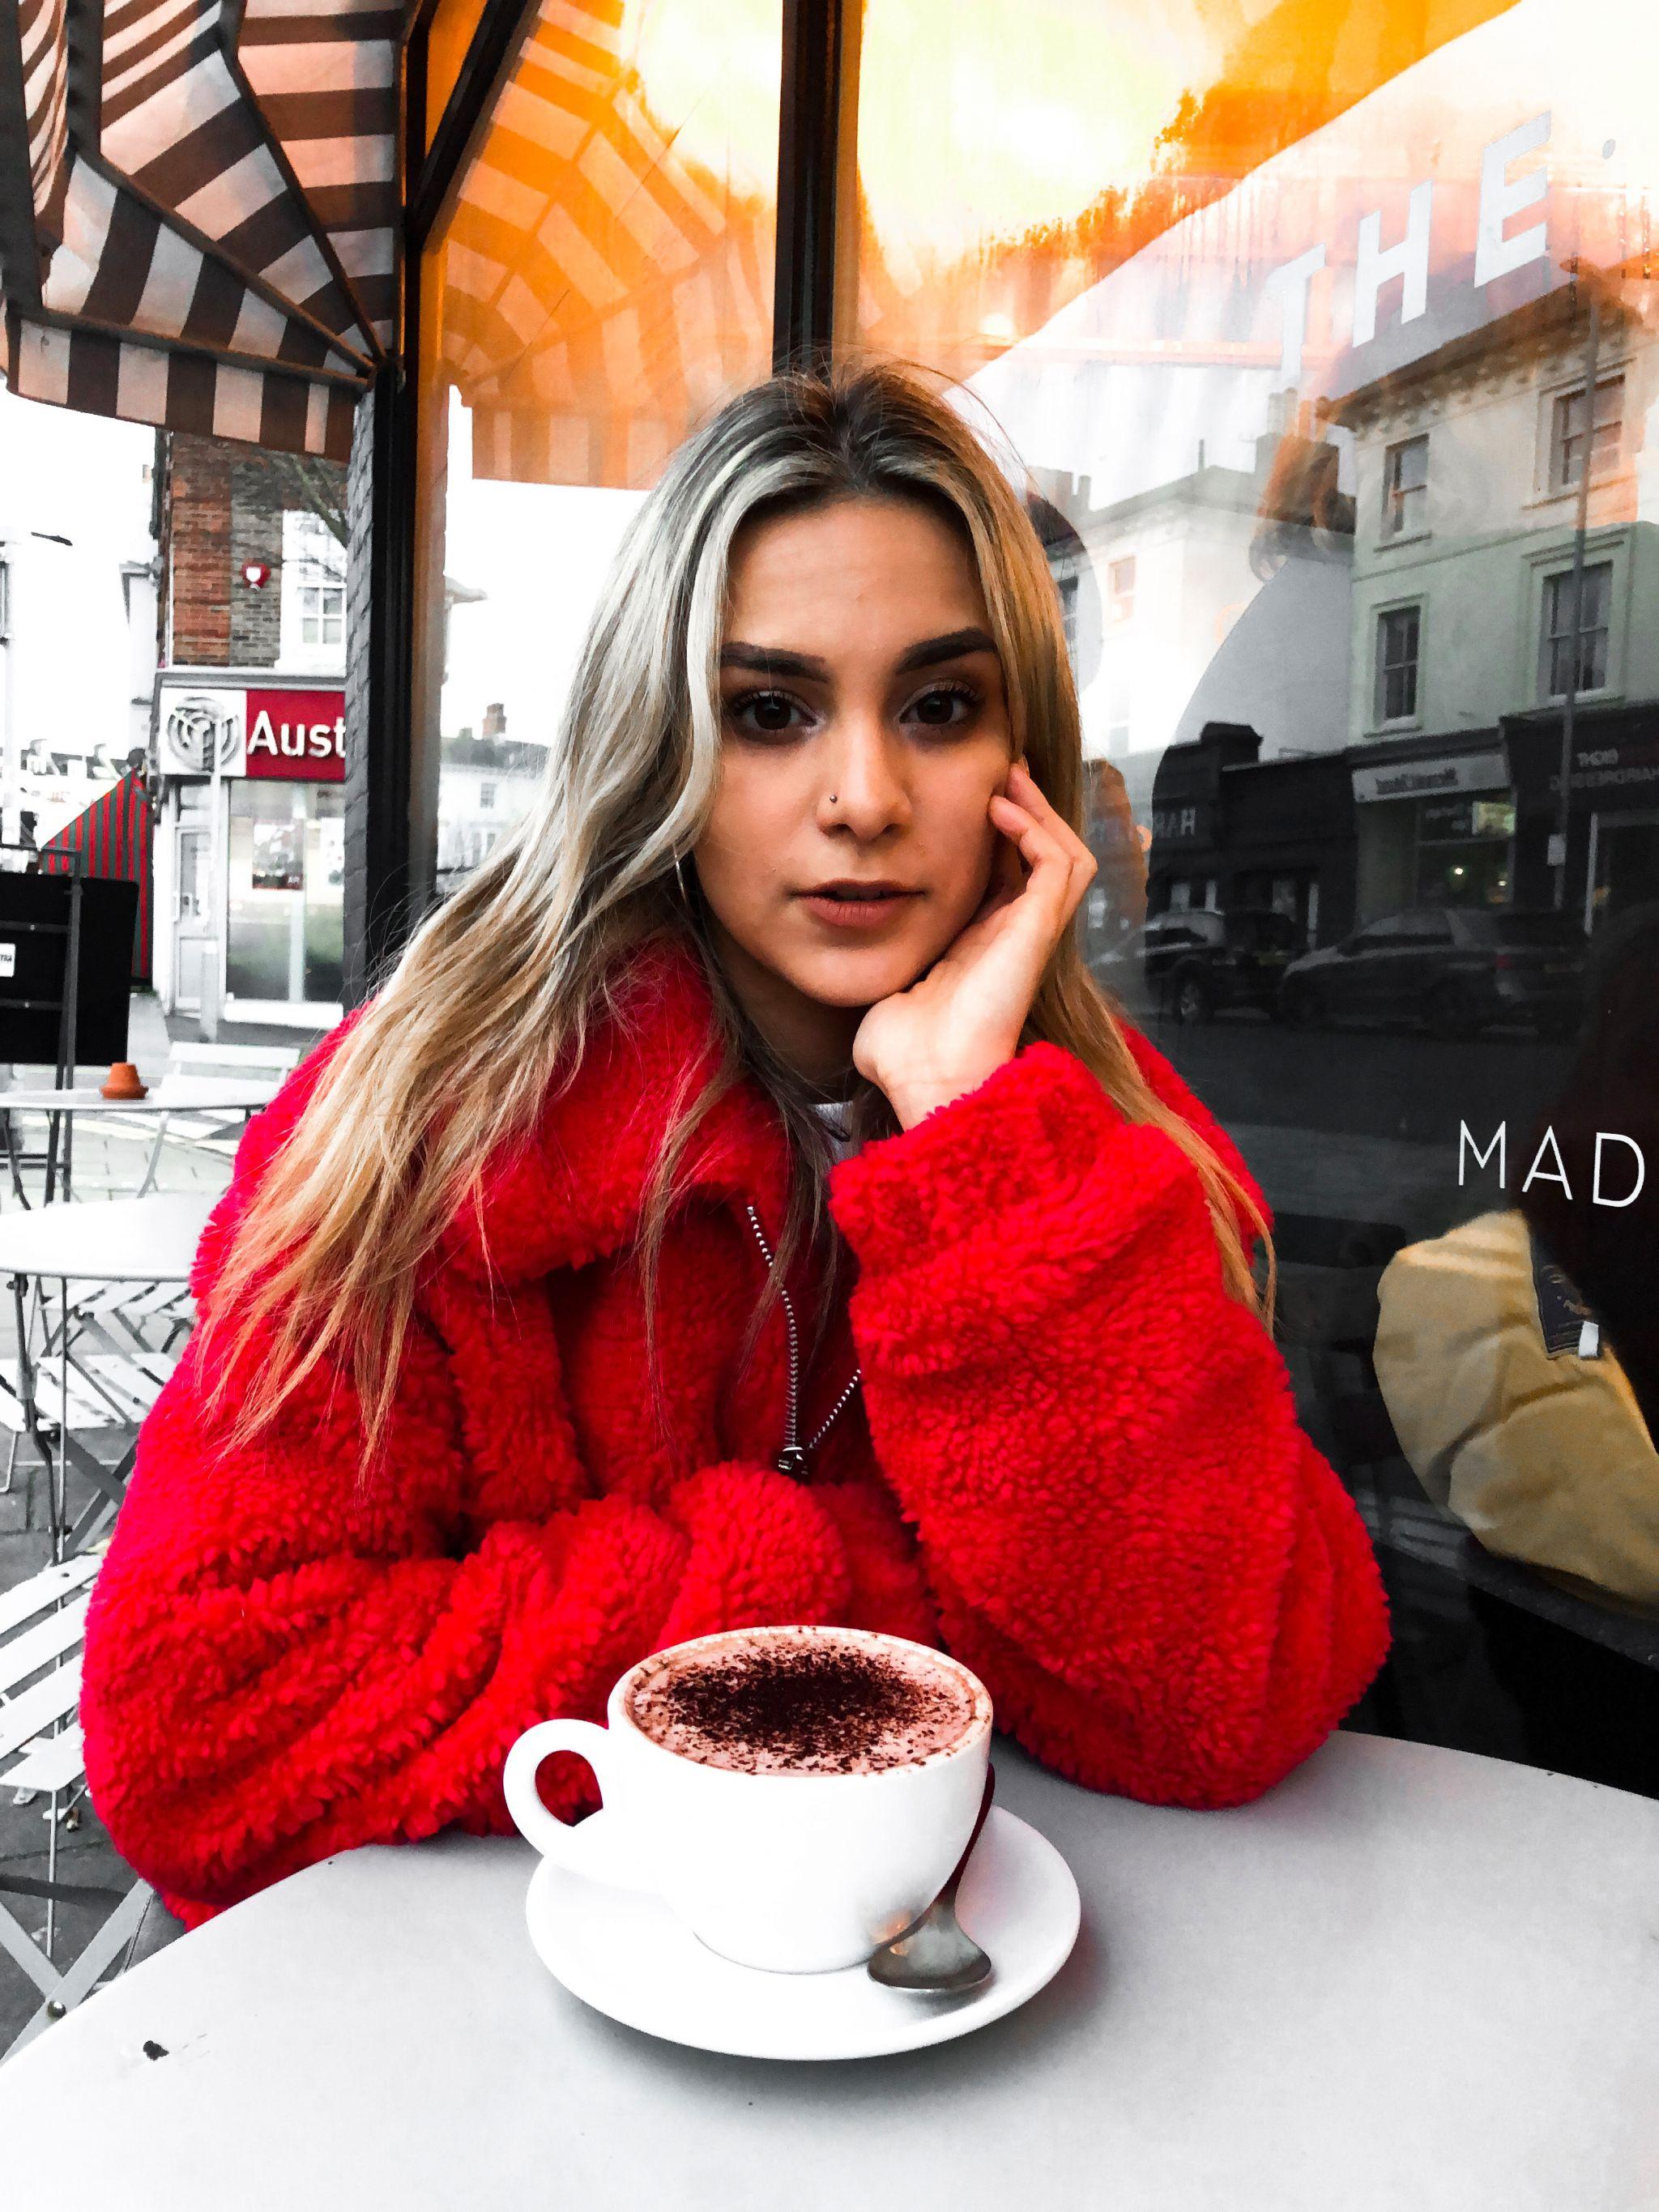 yasmin stefanie red teddy coat urban outfitters